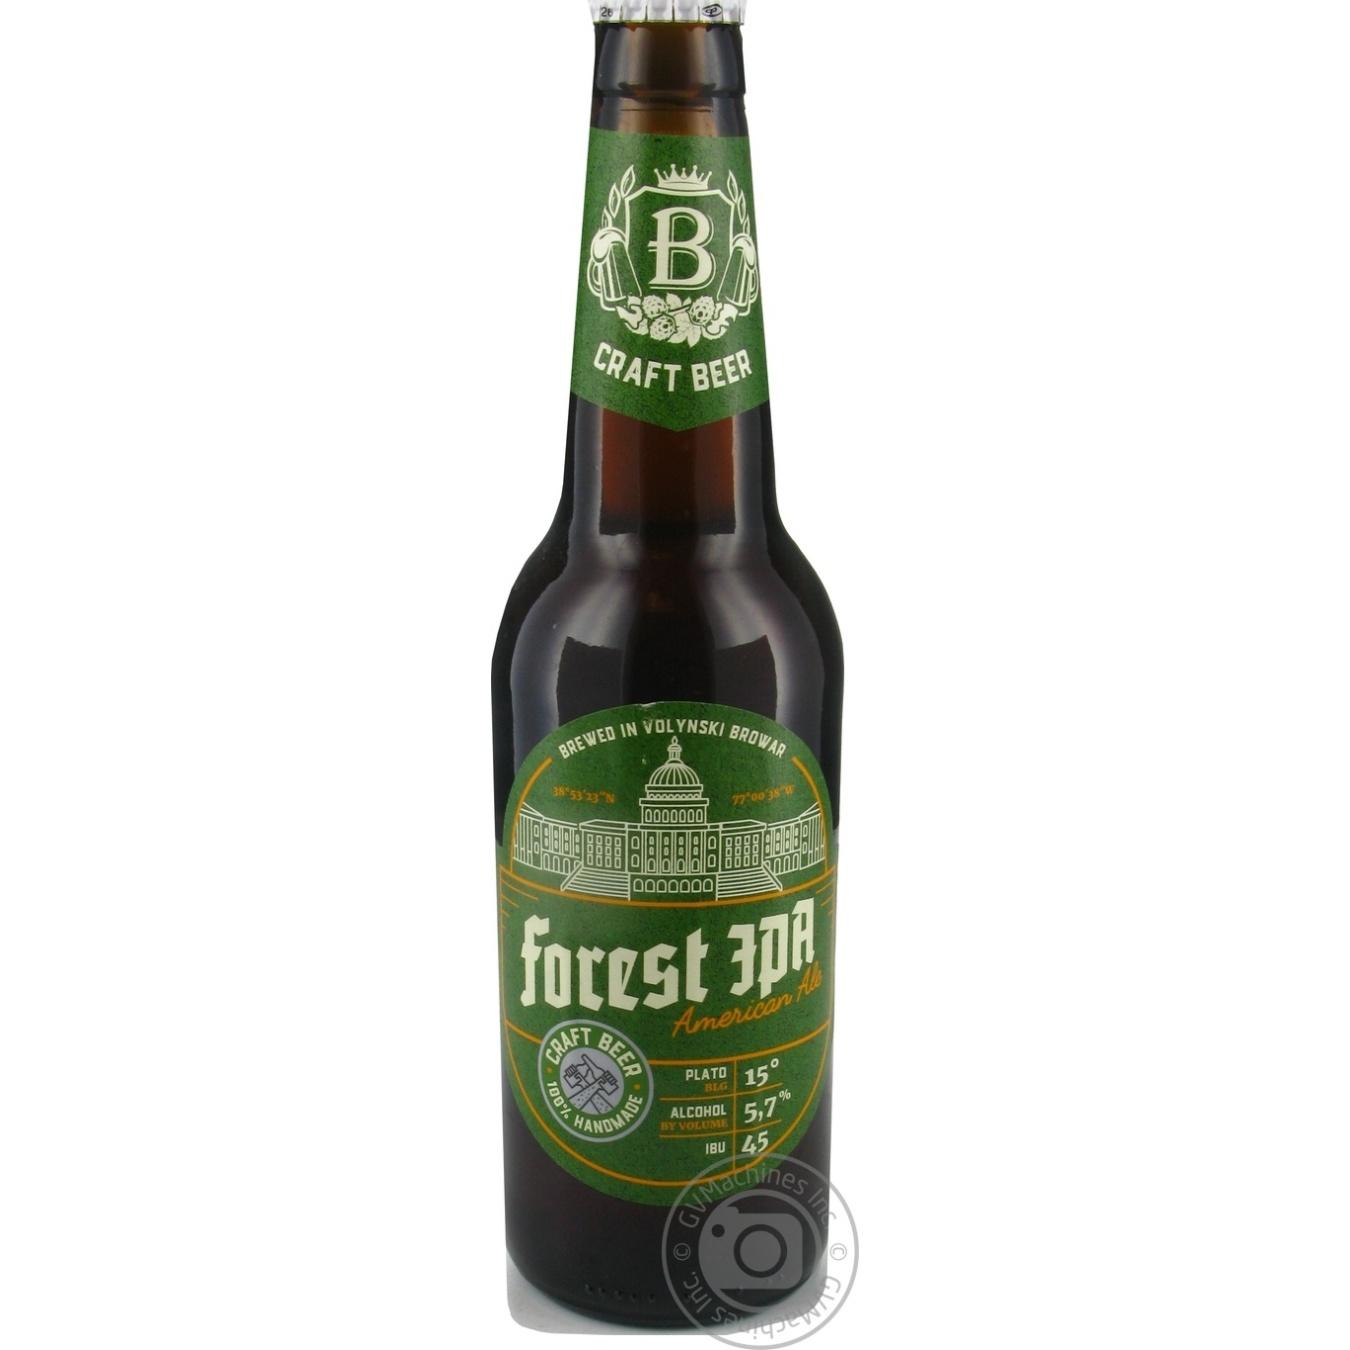 Пиво Волинський Бровар Forest IPA American Ale світле 5,7%0,35л